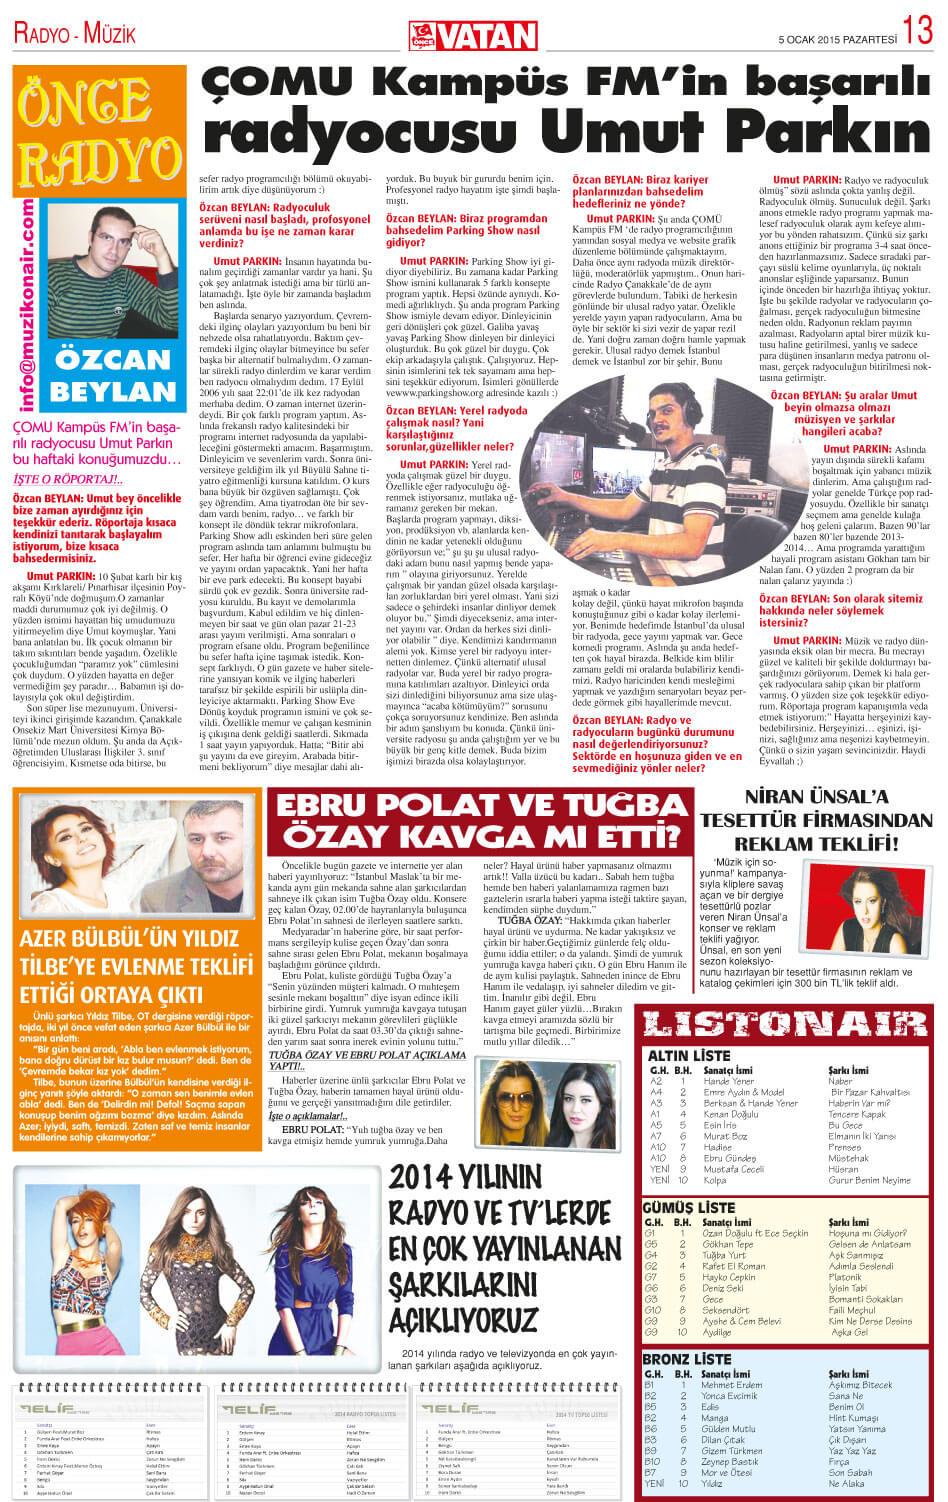 once-radyo-5-ocak-2015-muzikonair